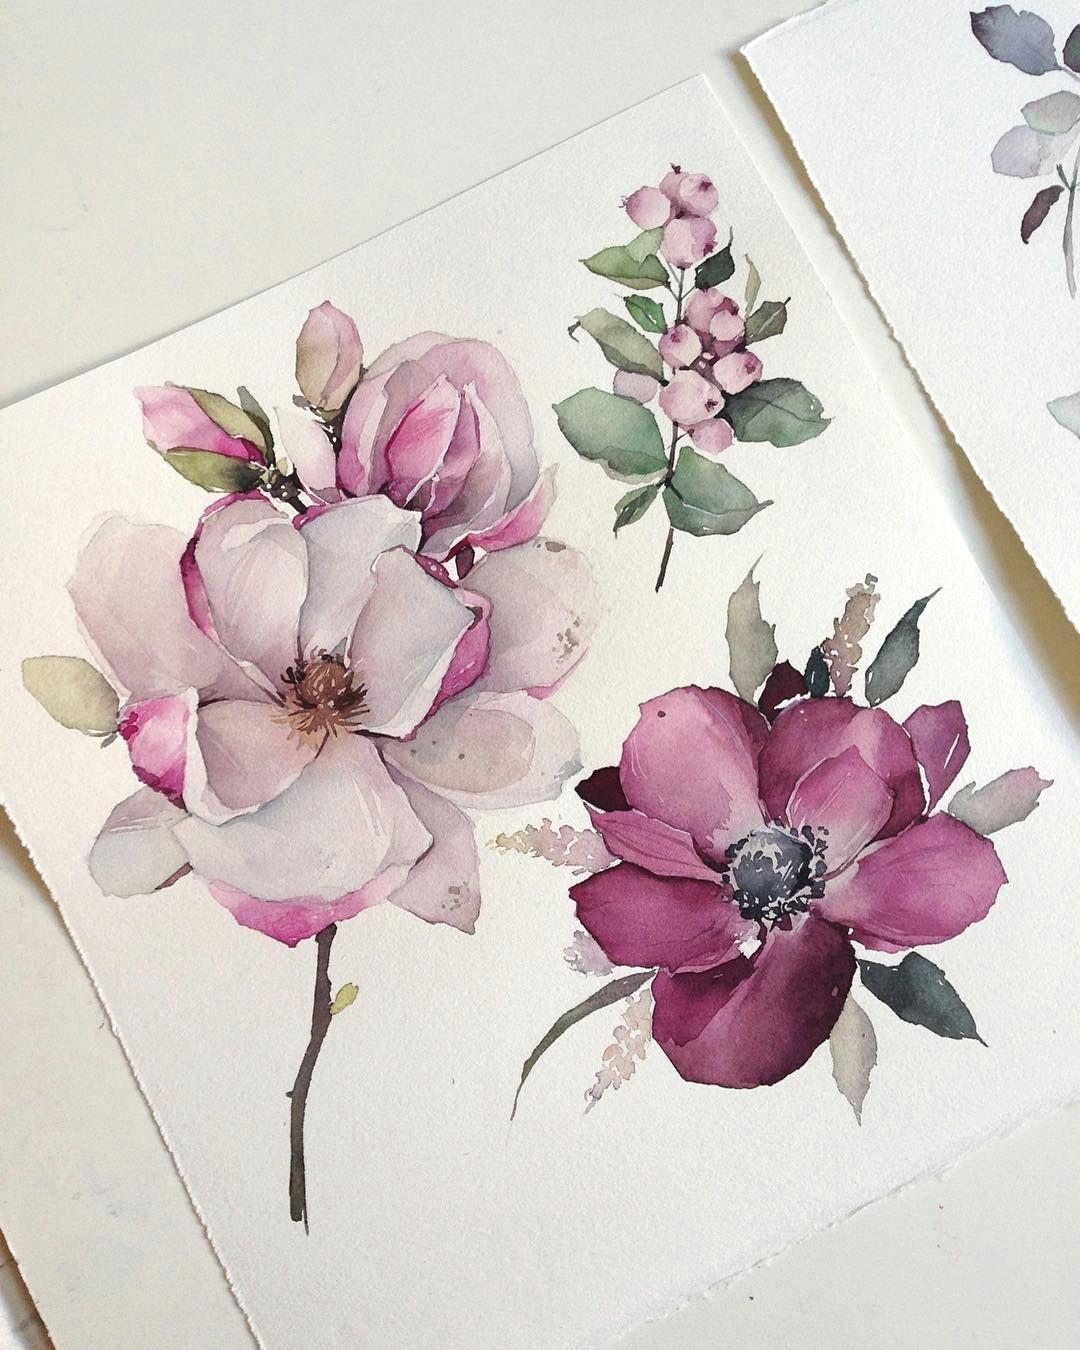 d d n d d n n d d d d d n dµd d kadantseva natalia d instagram rose peony art